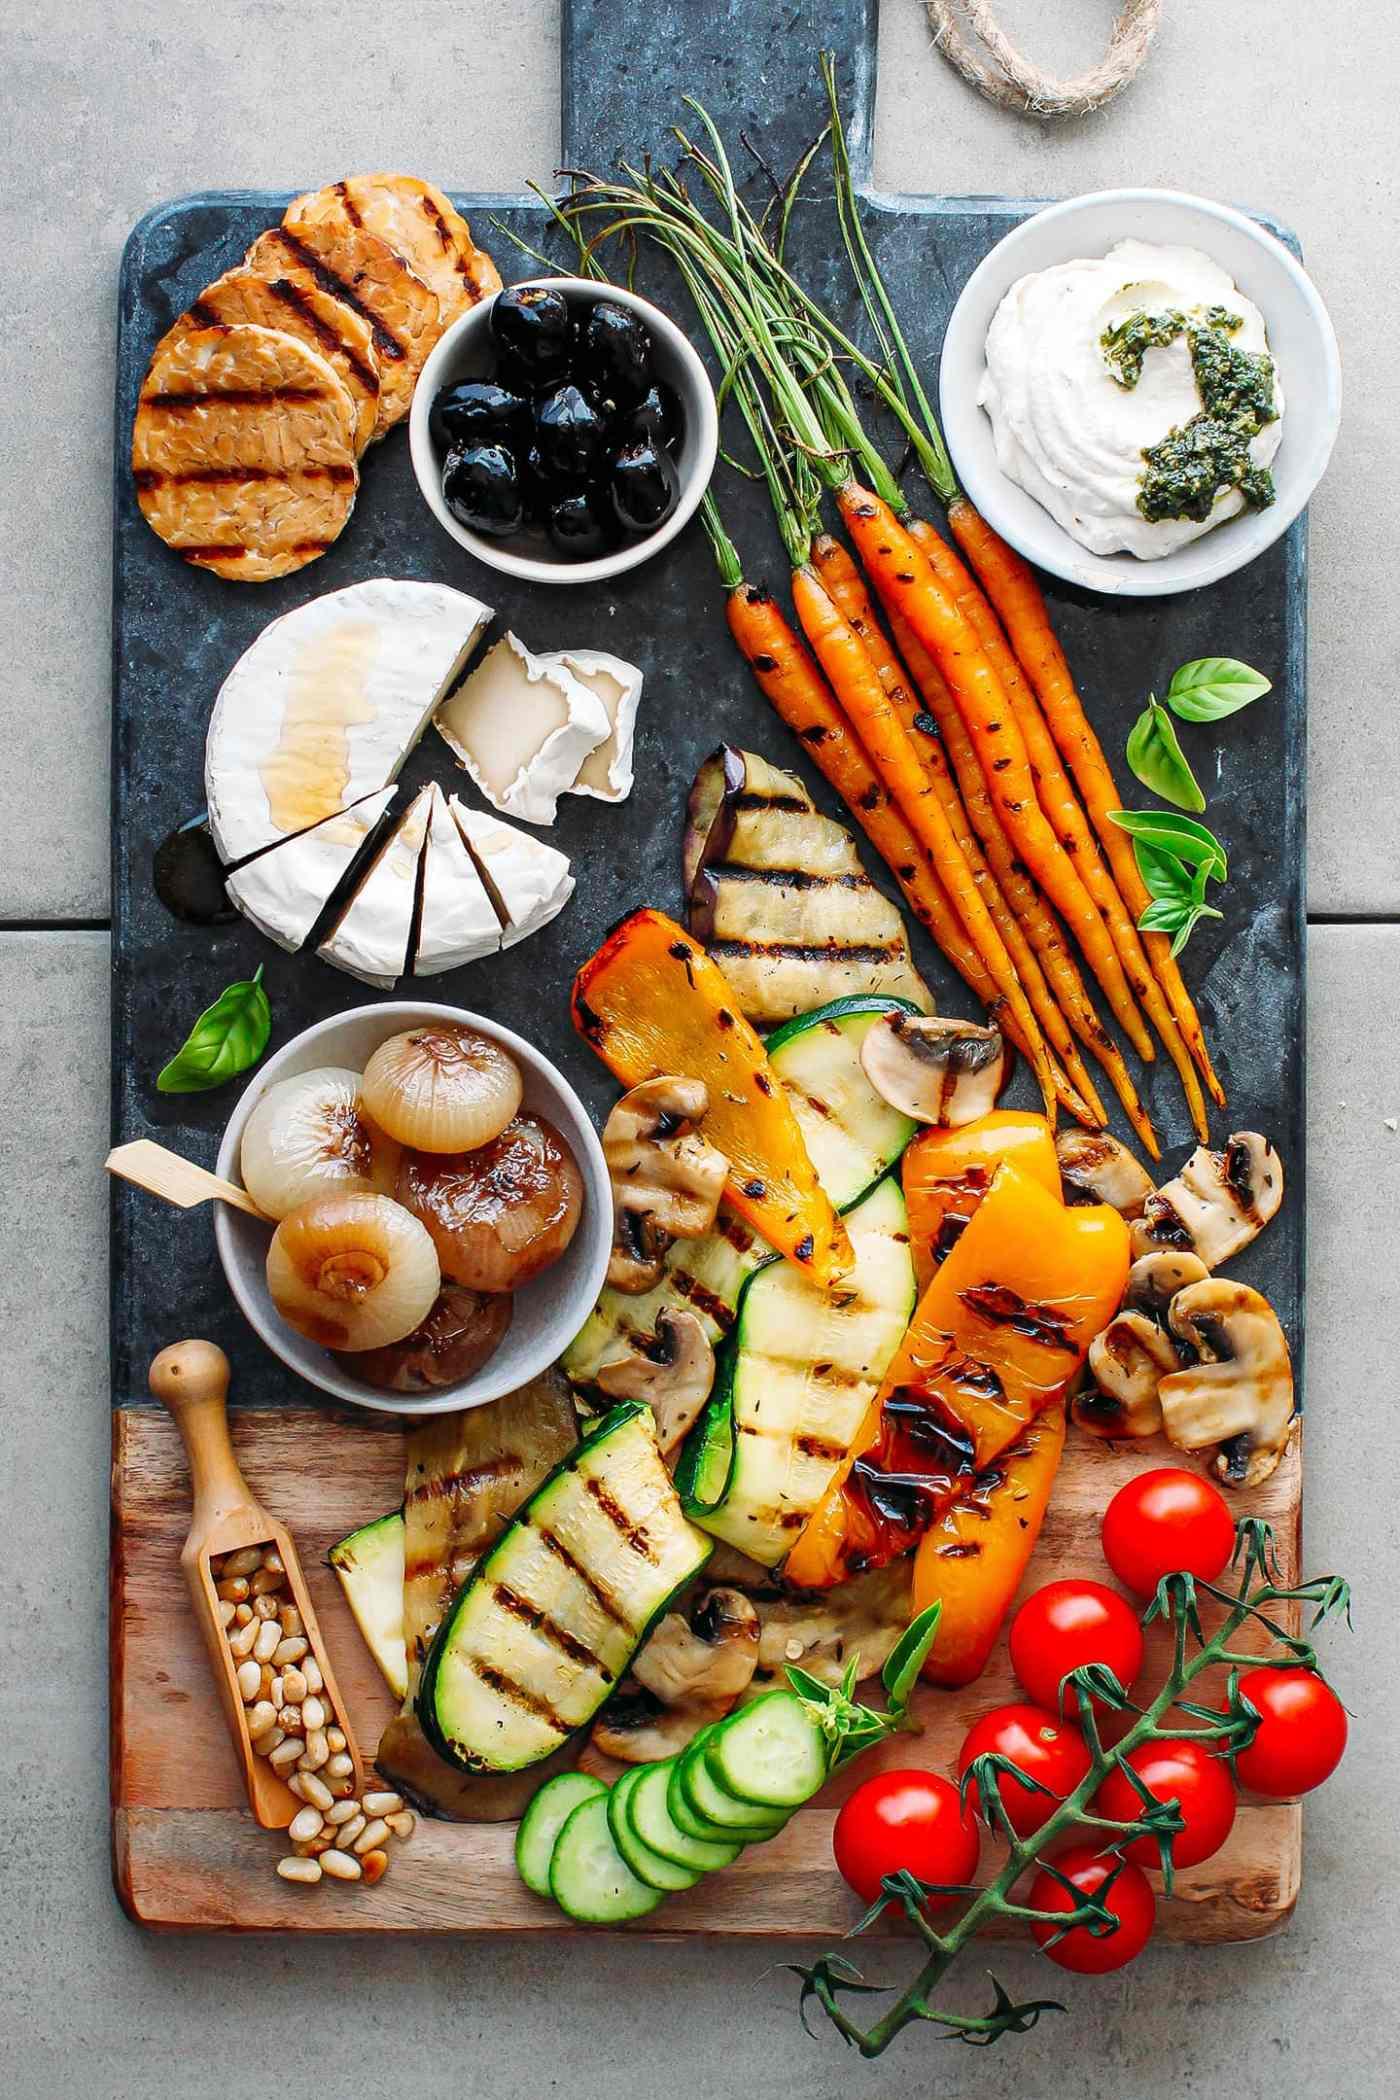 Loaded Vegan Antipasto Platter